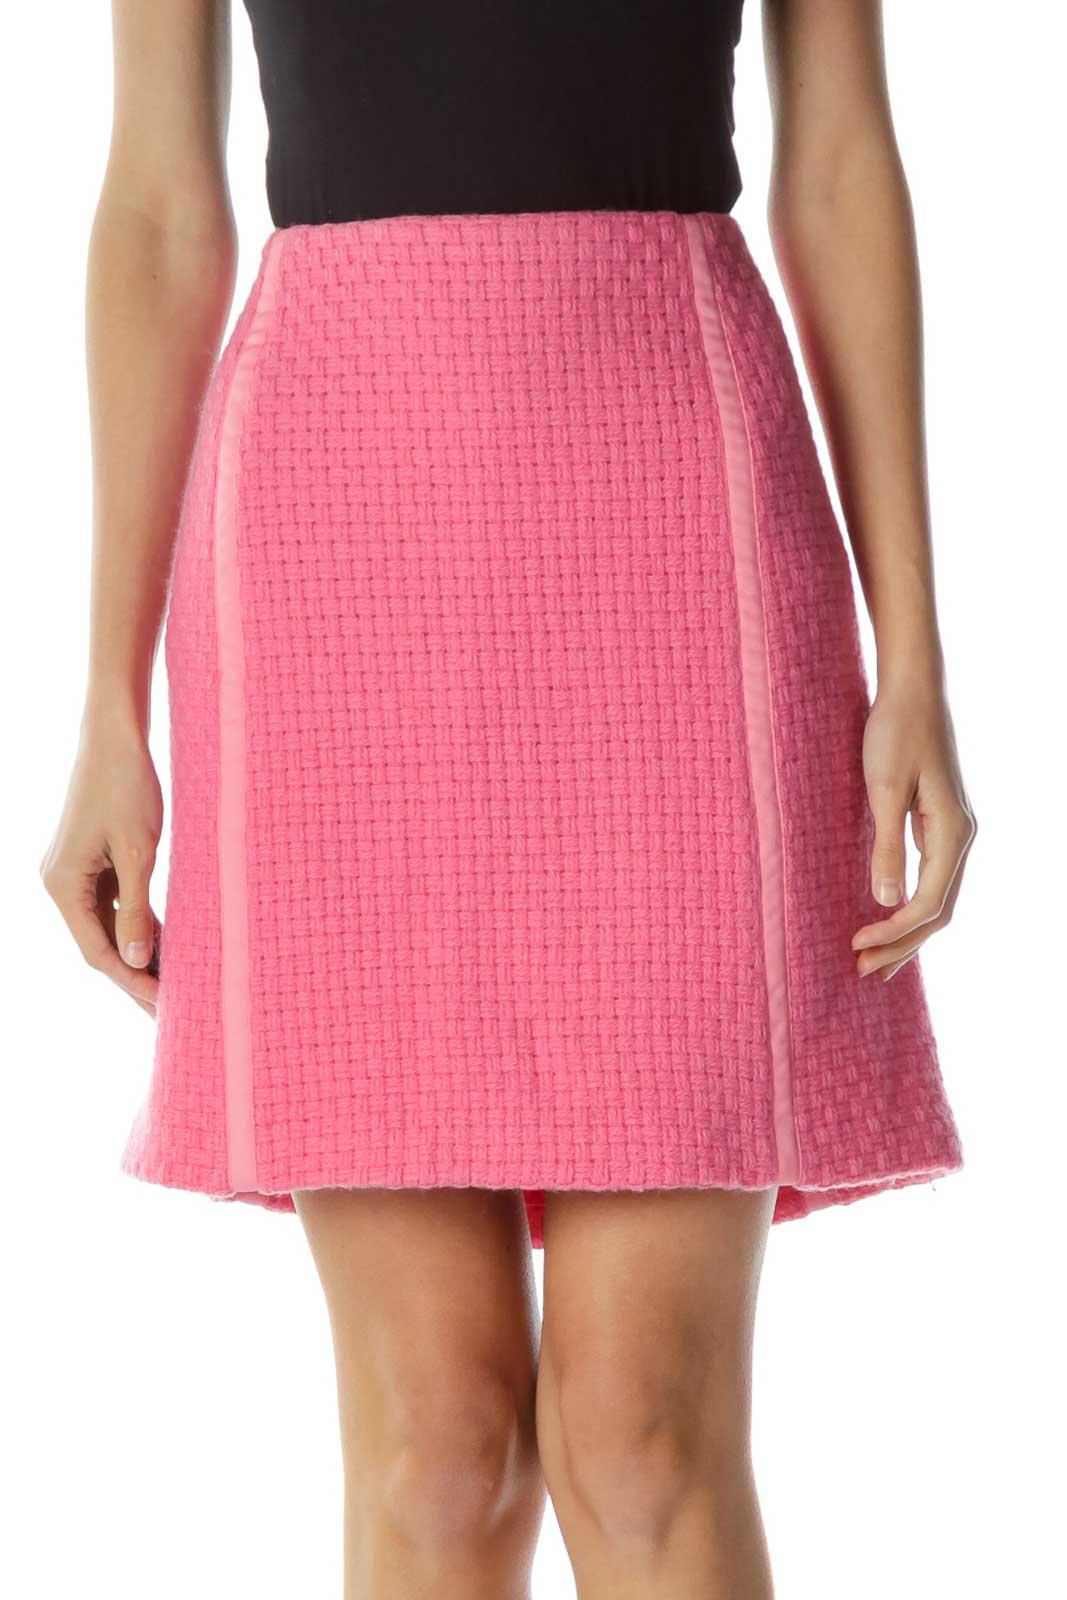 Pink Tweed Pencil Skirt Front